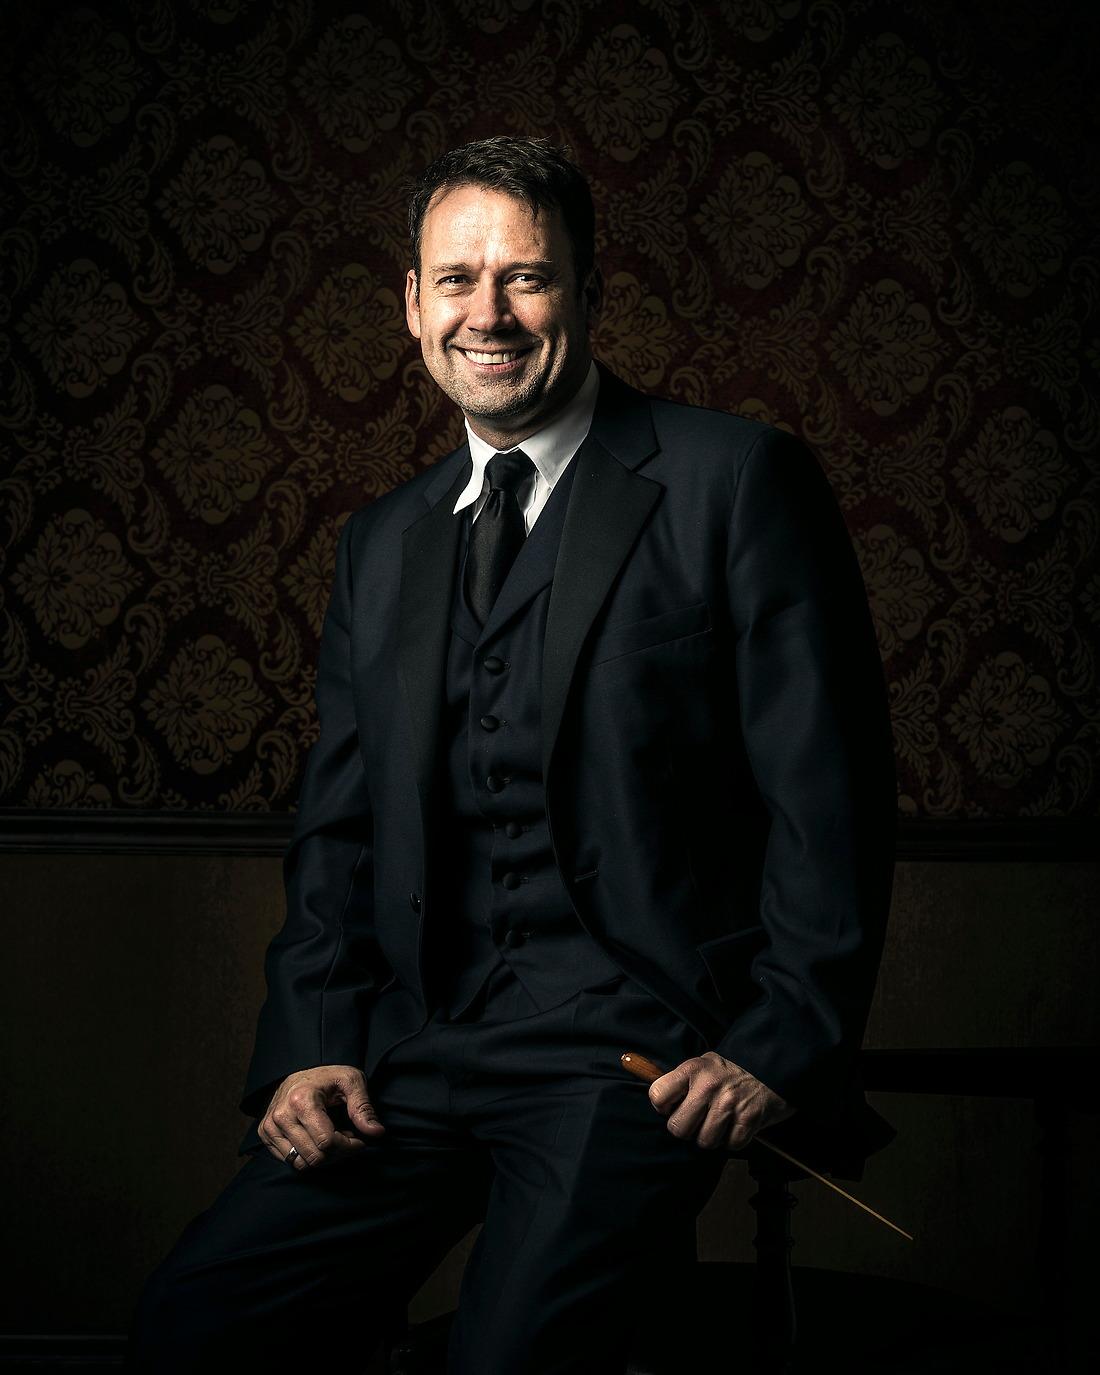 Robert Moody Music Director of Winston-Salem Symphony, Portland Symphony Orchestra, Artistic Director of Arizona Musicfest. — © Jeremy Lock/